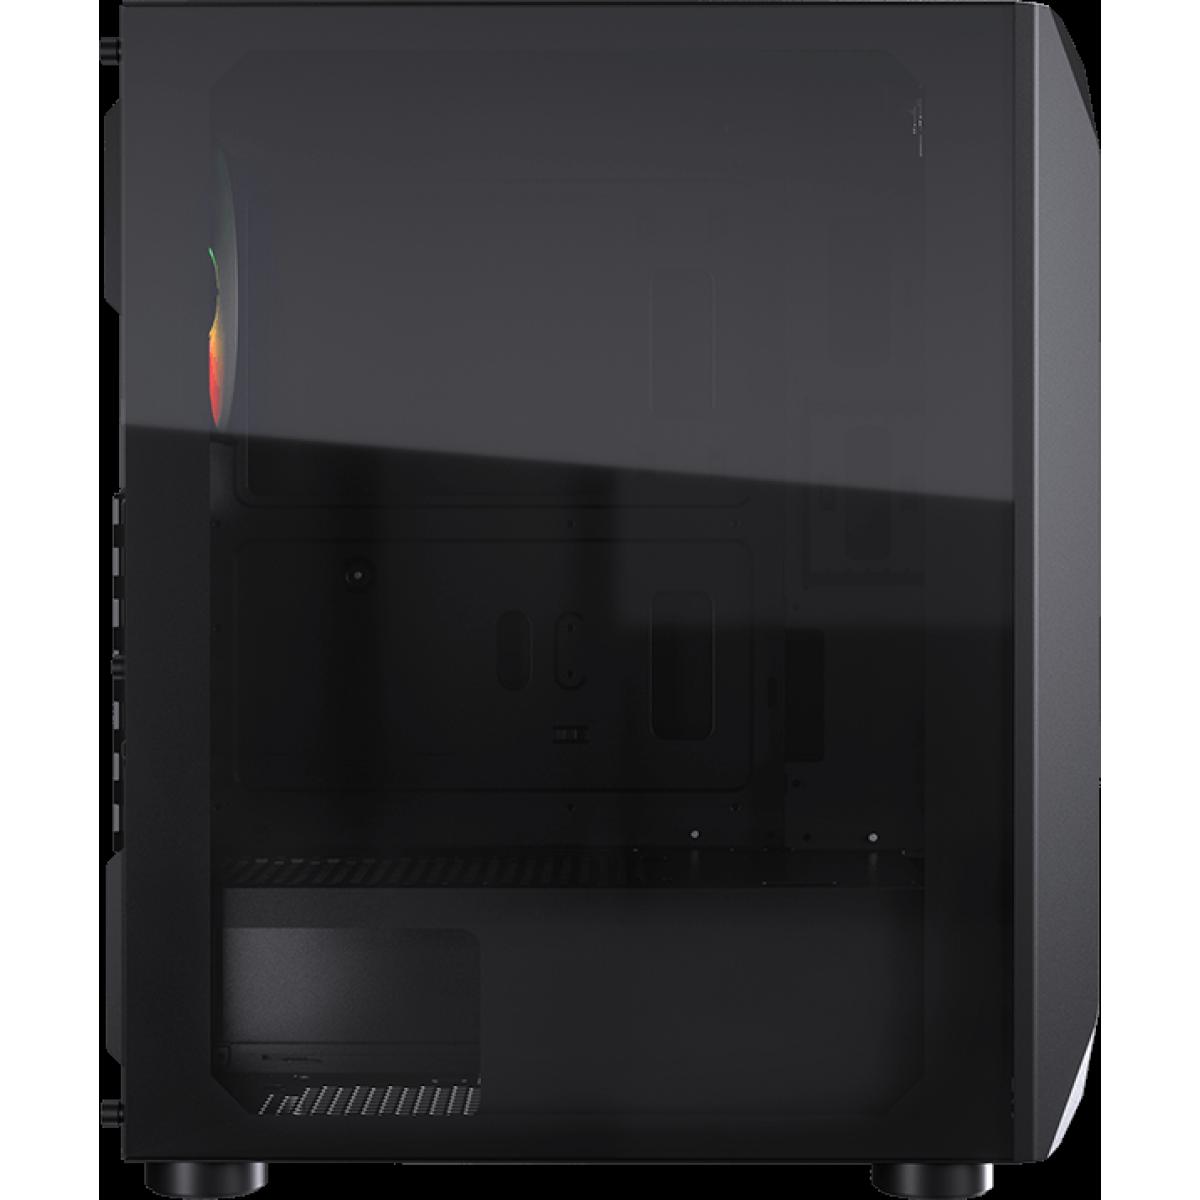 Gabinete Gamer Cougar, MX410-T, Mid-Tower, Vidro Temperado, Black, Sem Fonte, Com 1 Fan